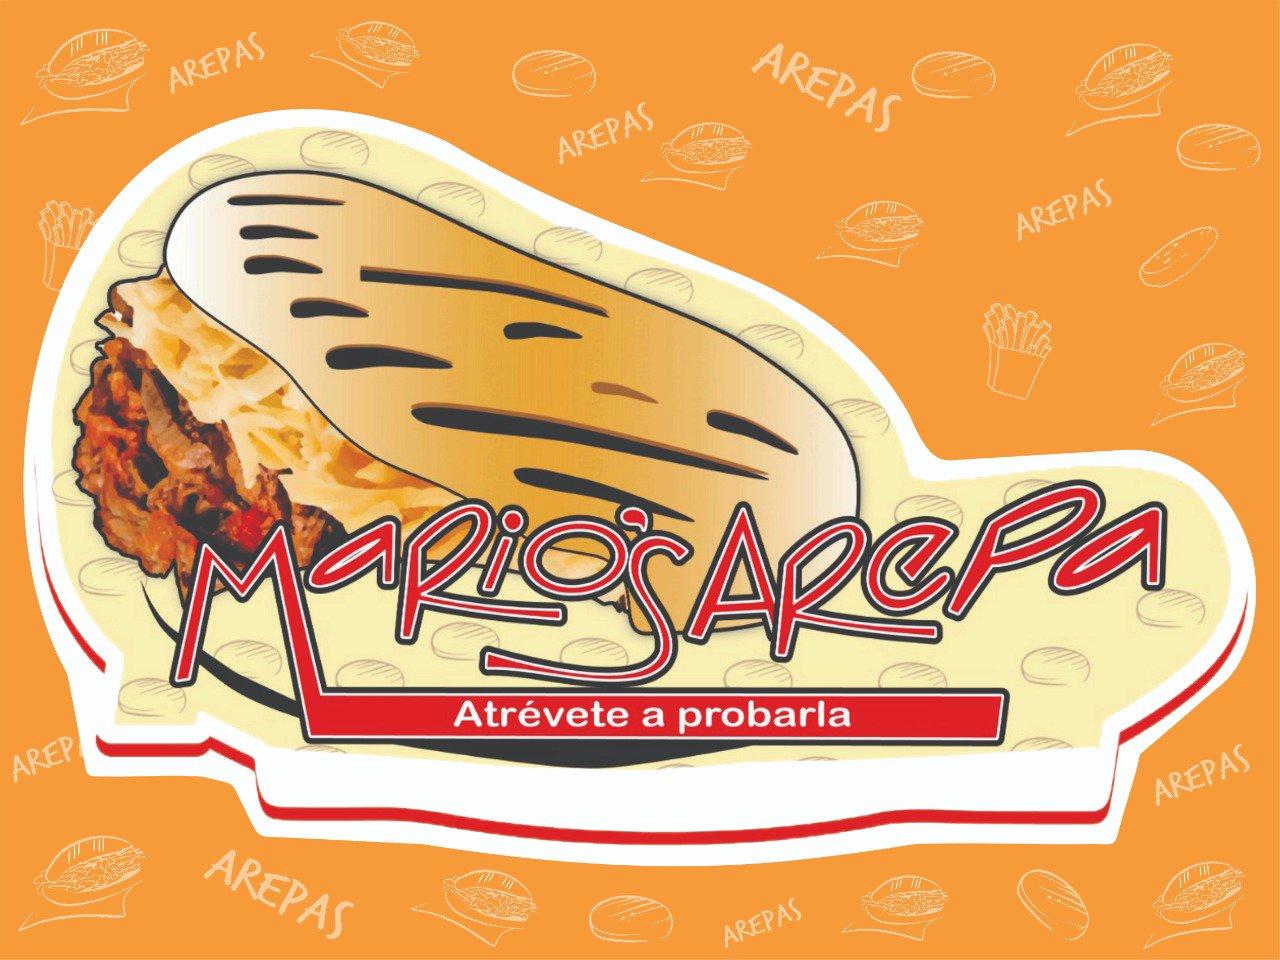 Mario's Arepa